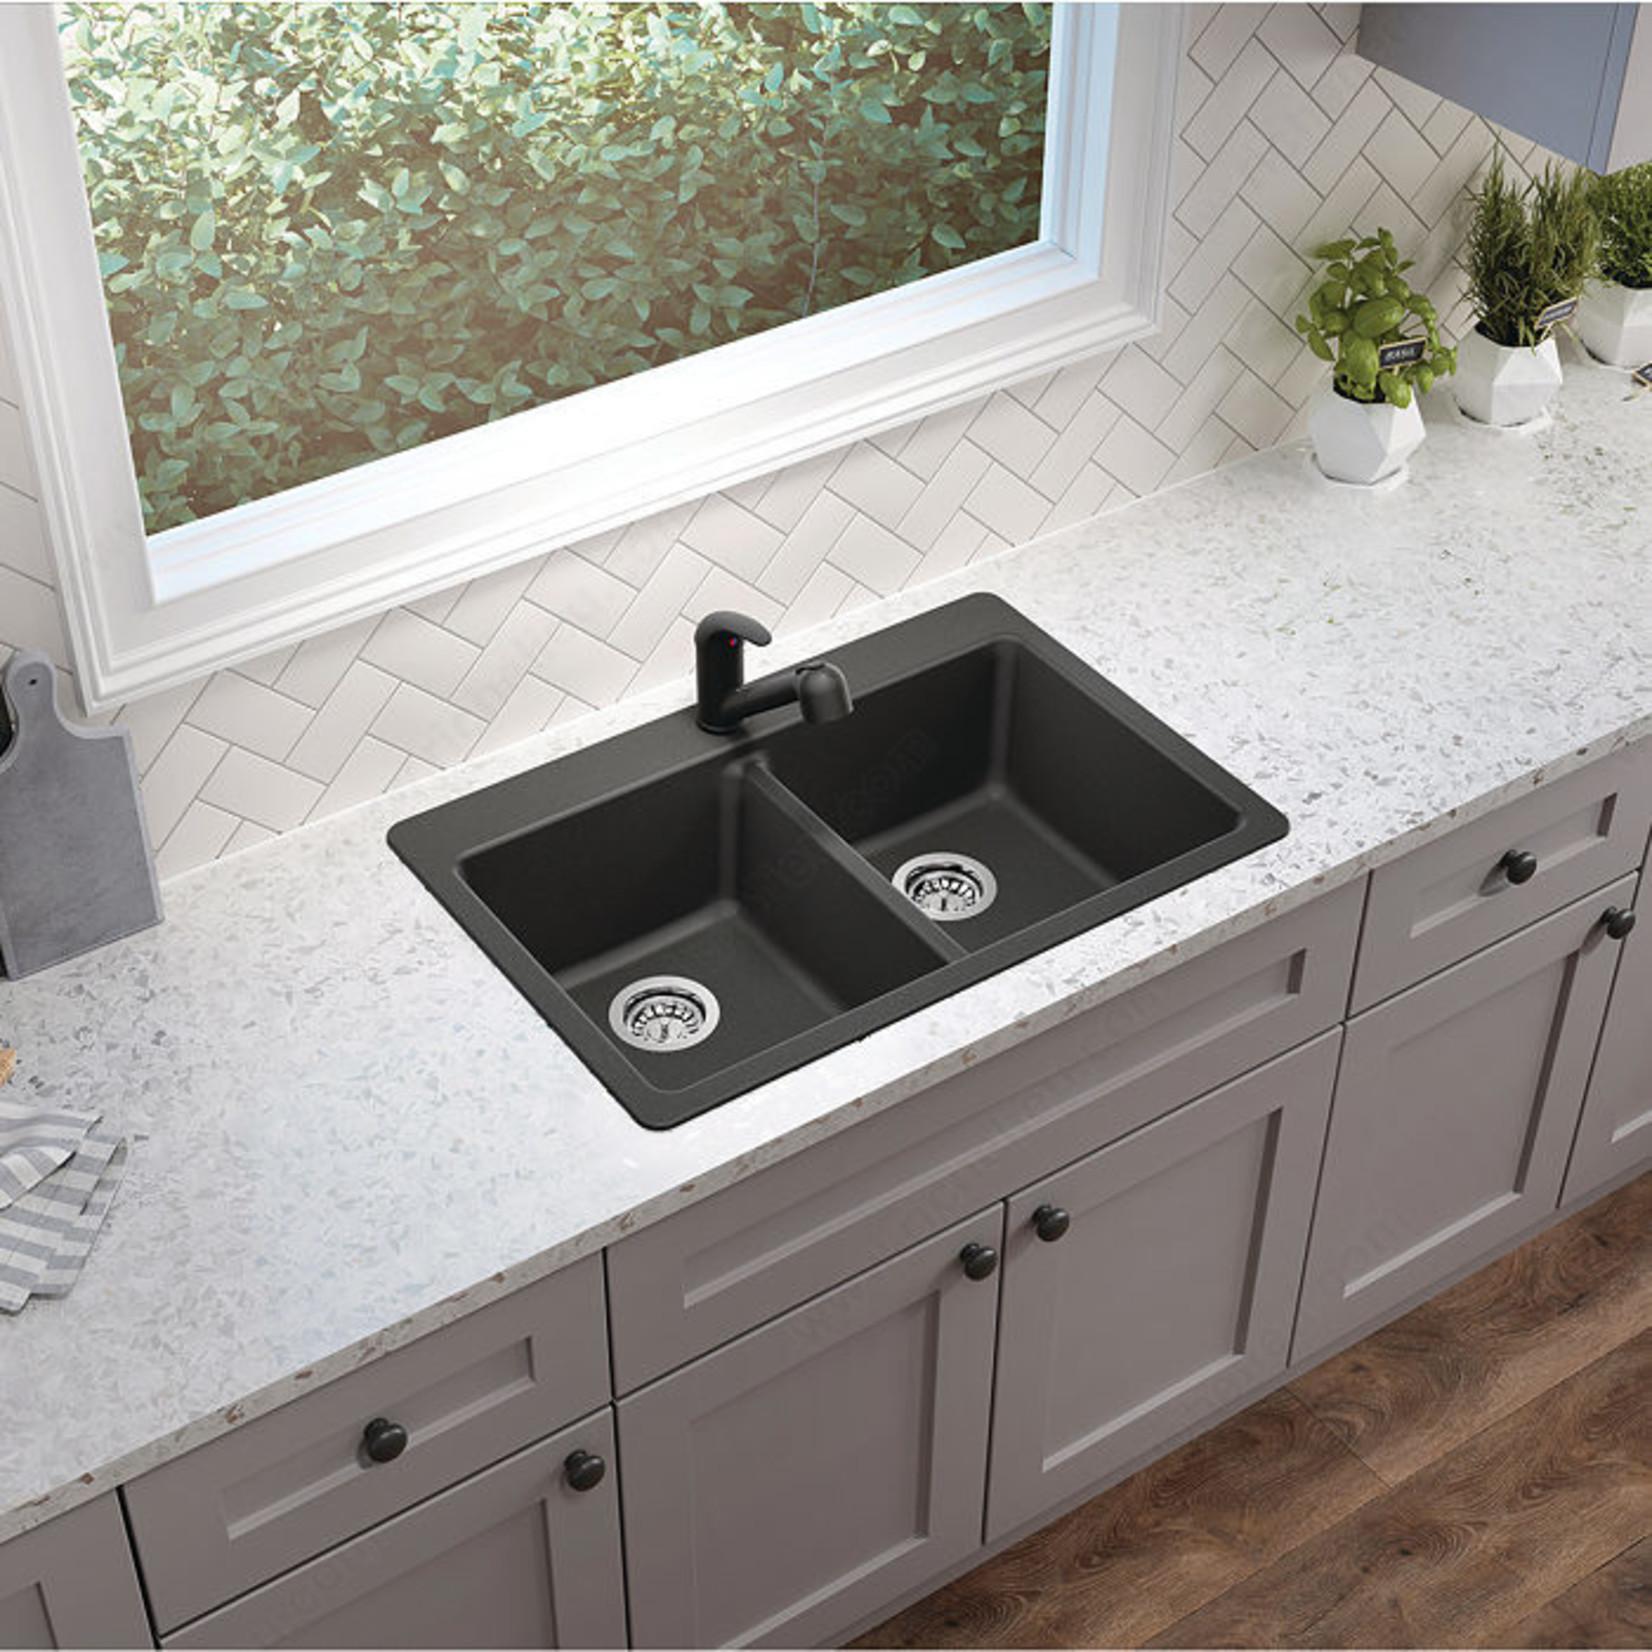 Black double granite sink MB203GR 31``x20 1/2 '' divided